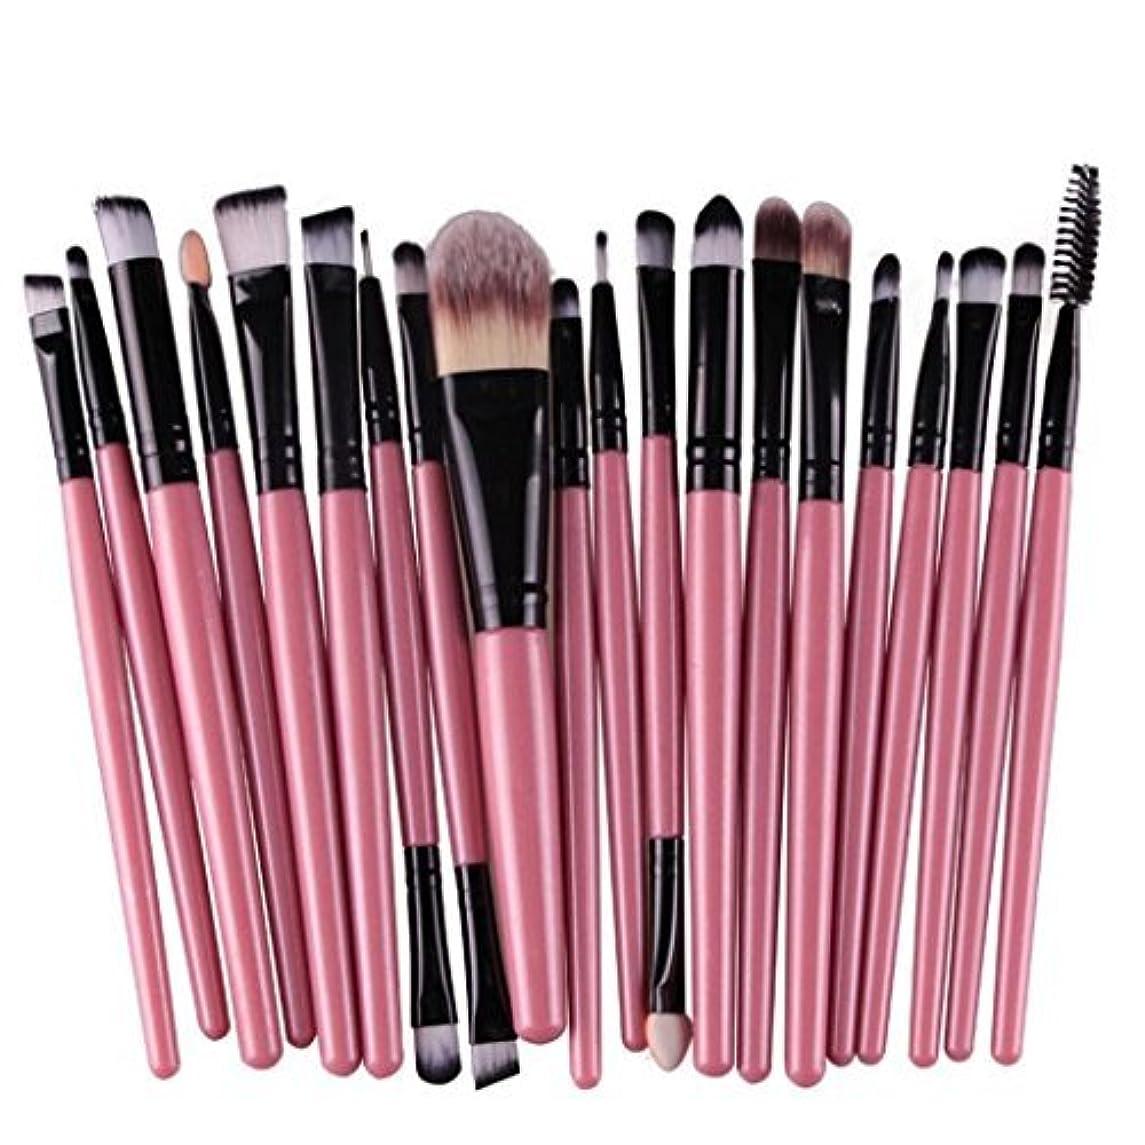 Doitsa プロメイクアップブラシ メイクブラシセット 化粧筆 メイクツール 高級メイクブラシ 化粧ブラシ ファンデーションブラシ コンシーラーブラシ 多機能 アイシャドウブラシ ピンク+黒色